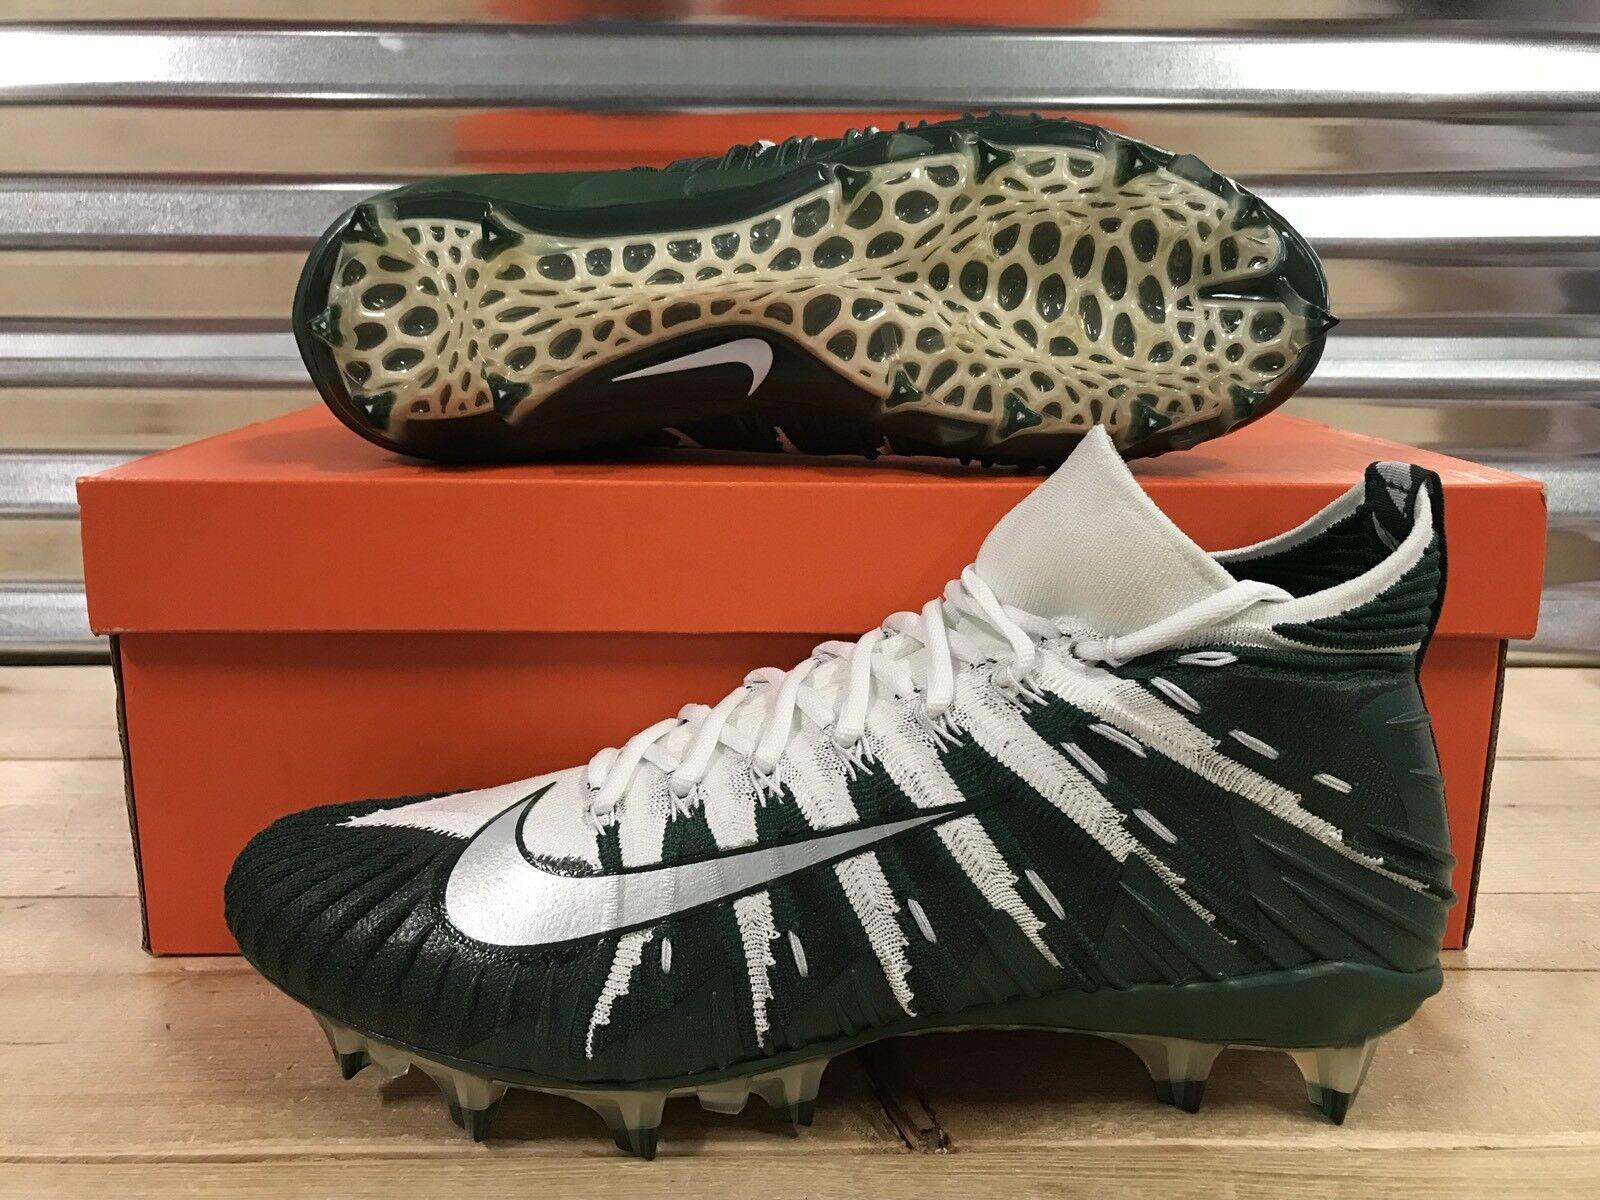 Nike Alpha Menace Elite Football Cleats White Fir Green Silver SZ ( 877141-131 )